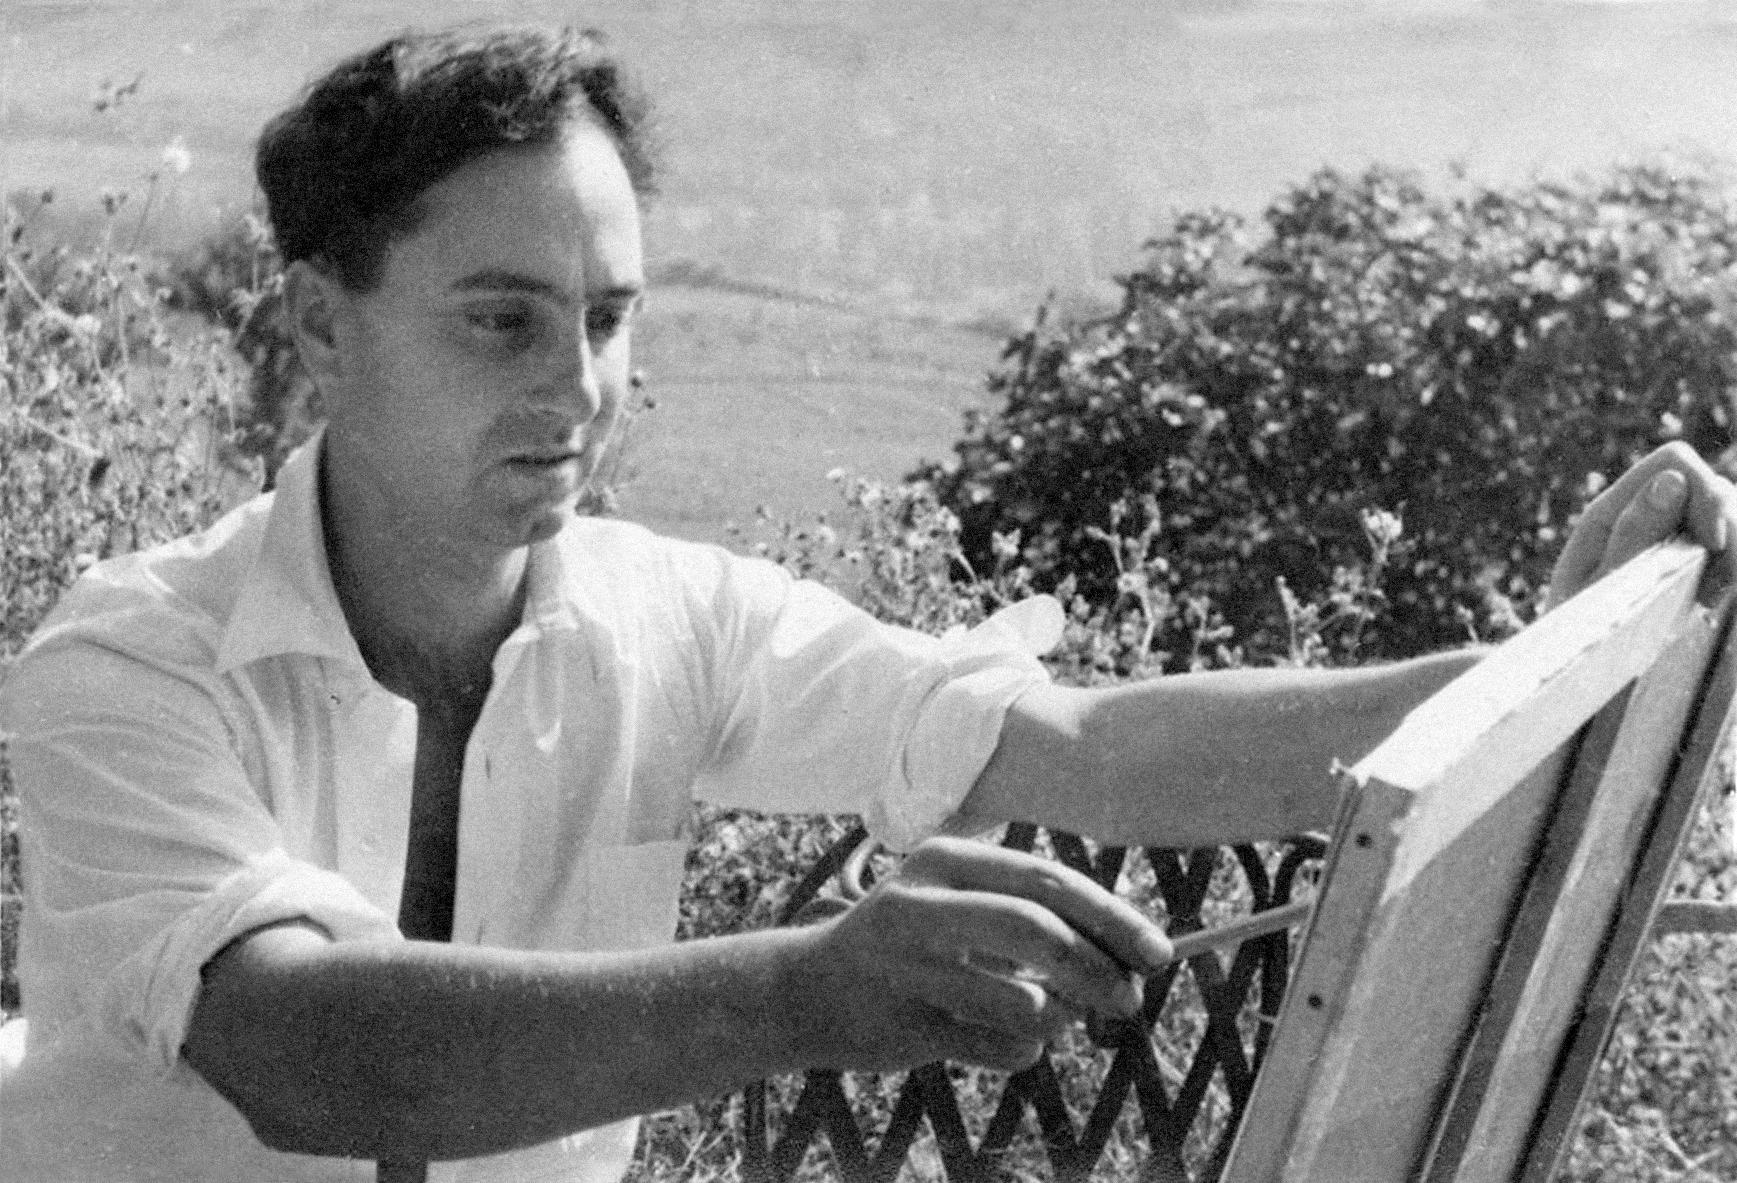 olivier debré - portrait 1951 ca faq